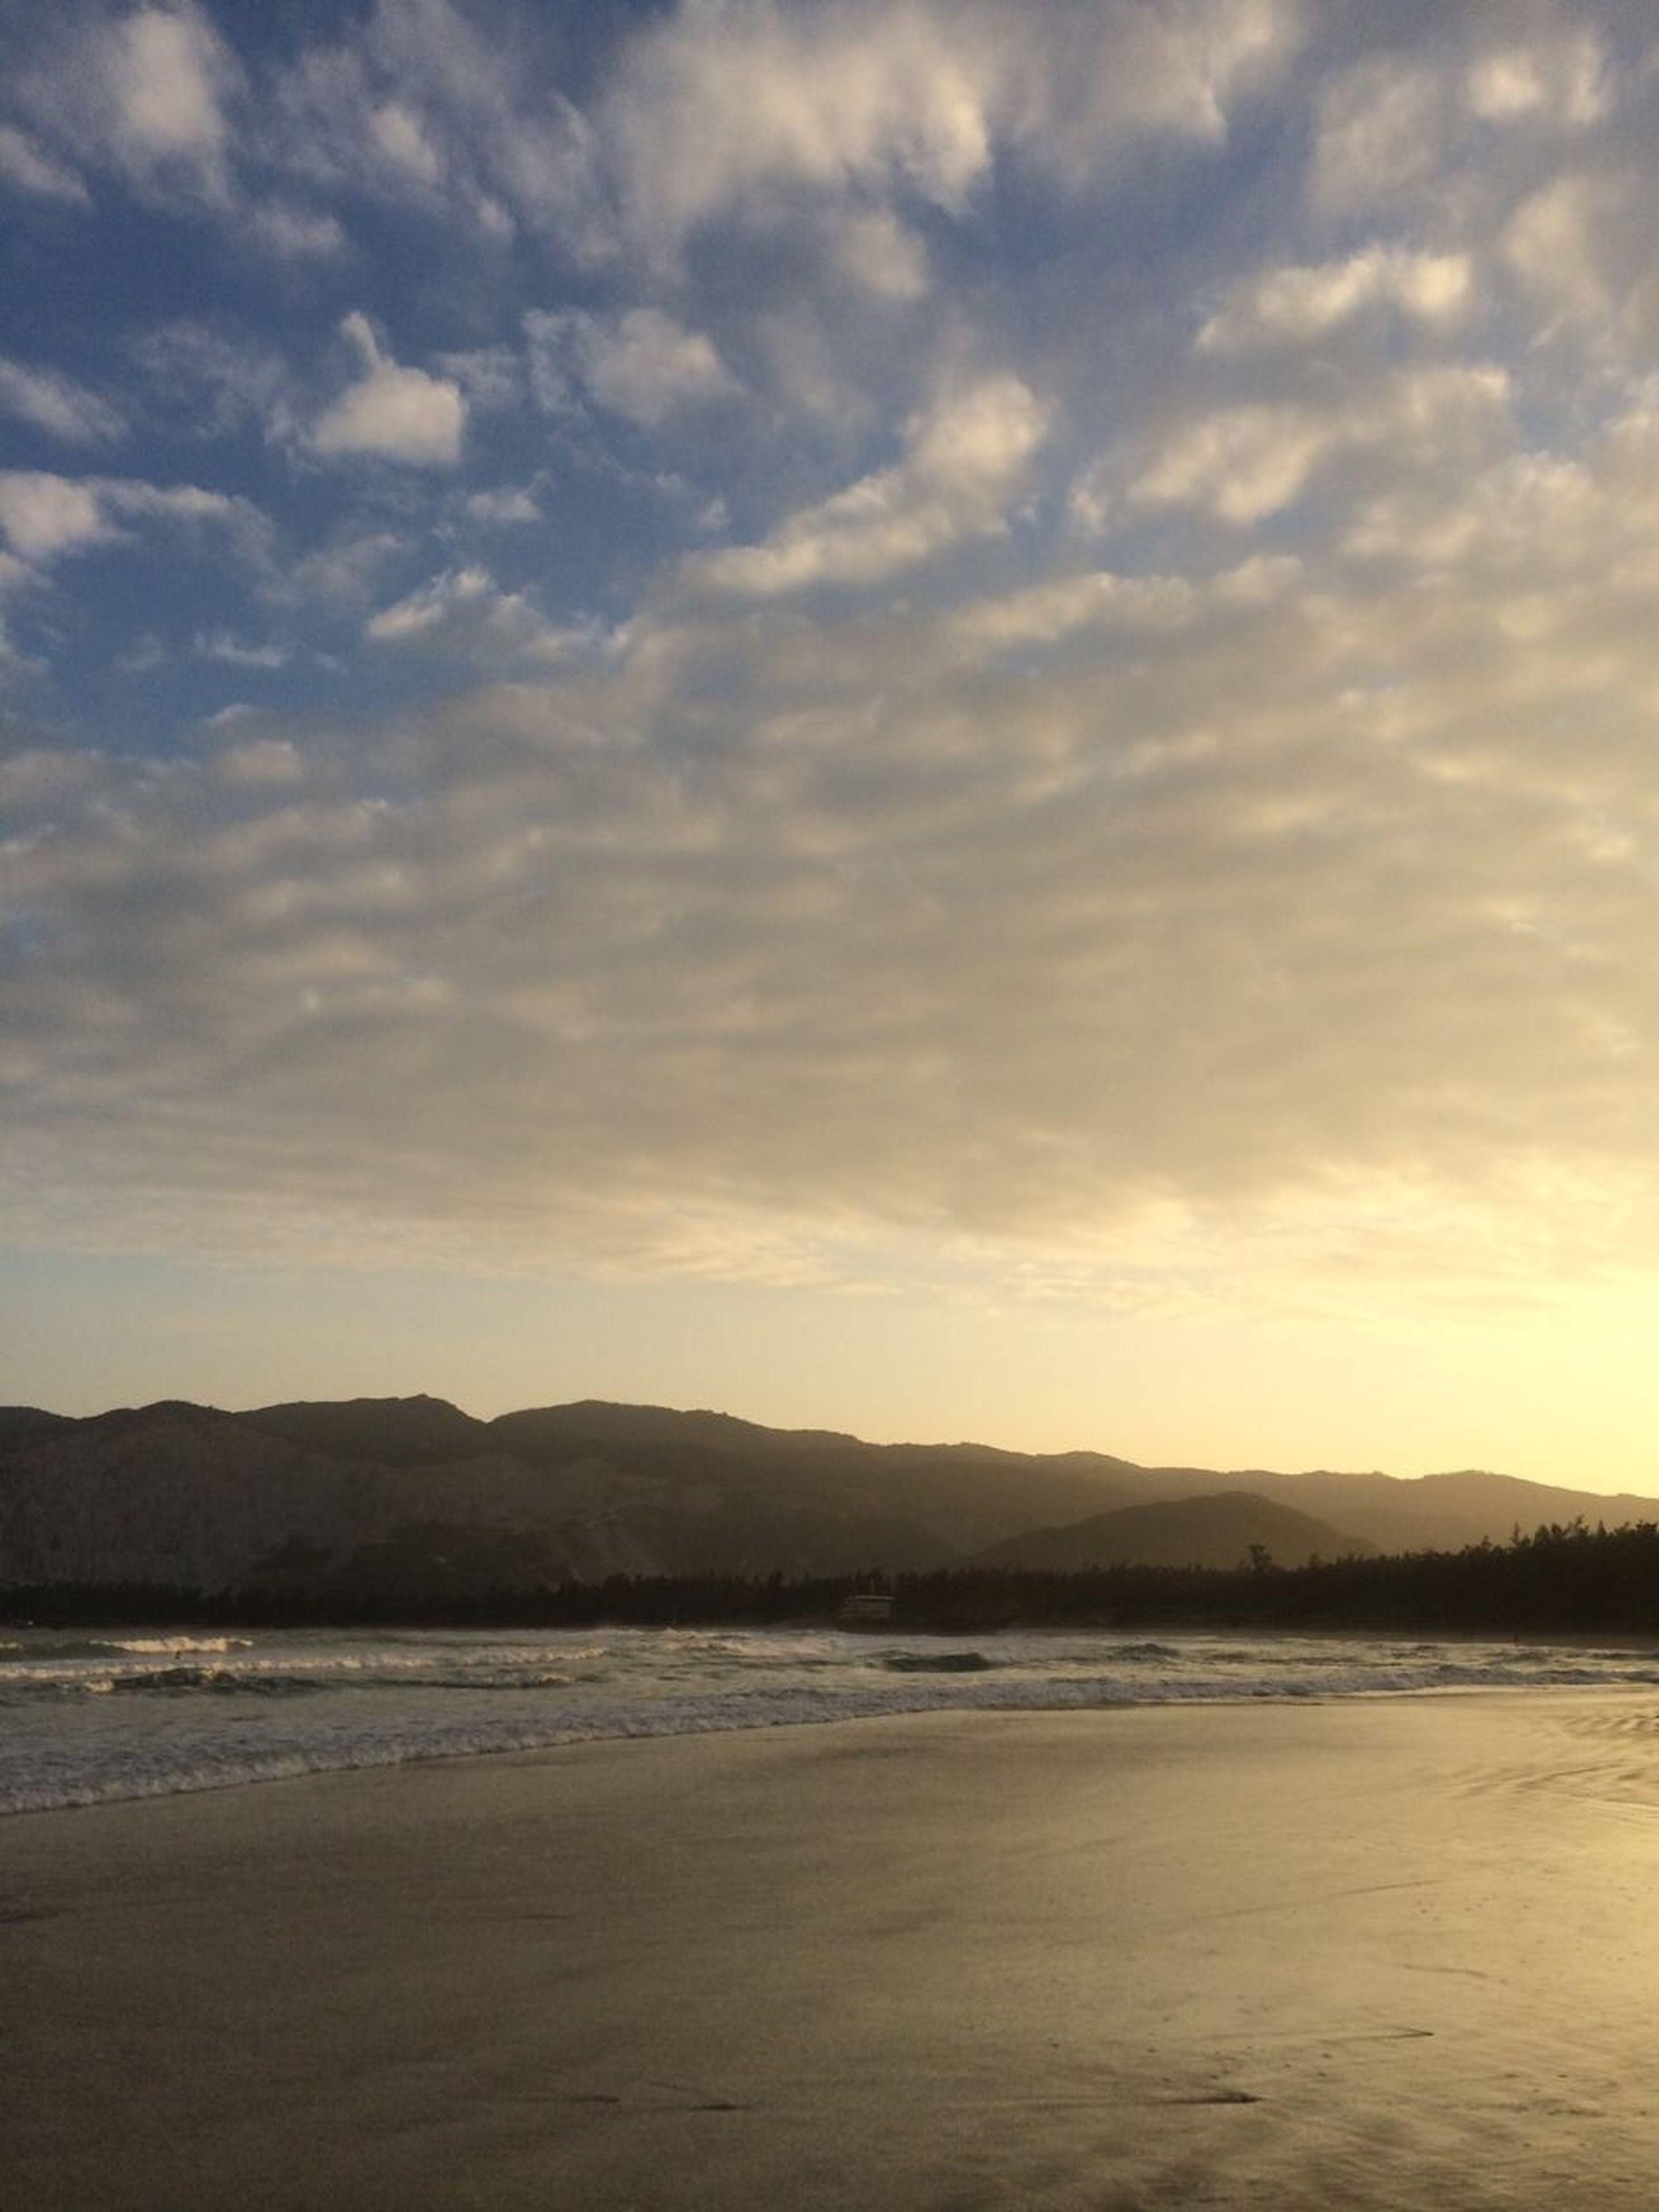 water, sky, scenics, tranquil scene, sea, tranquility, mountain, beauty in nature, cloud - sky, nature, beach, cloudy, idyllic, mountain range, cloud, sunset, waterfront, shore, non-urban scene, dusk